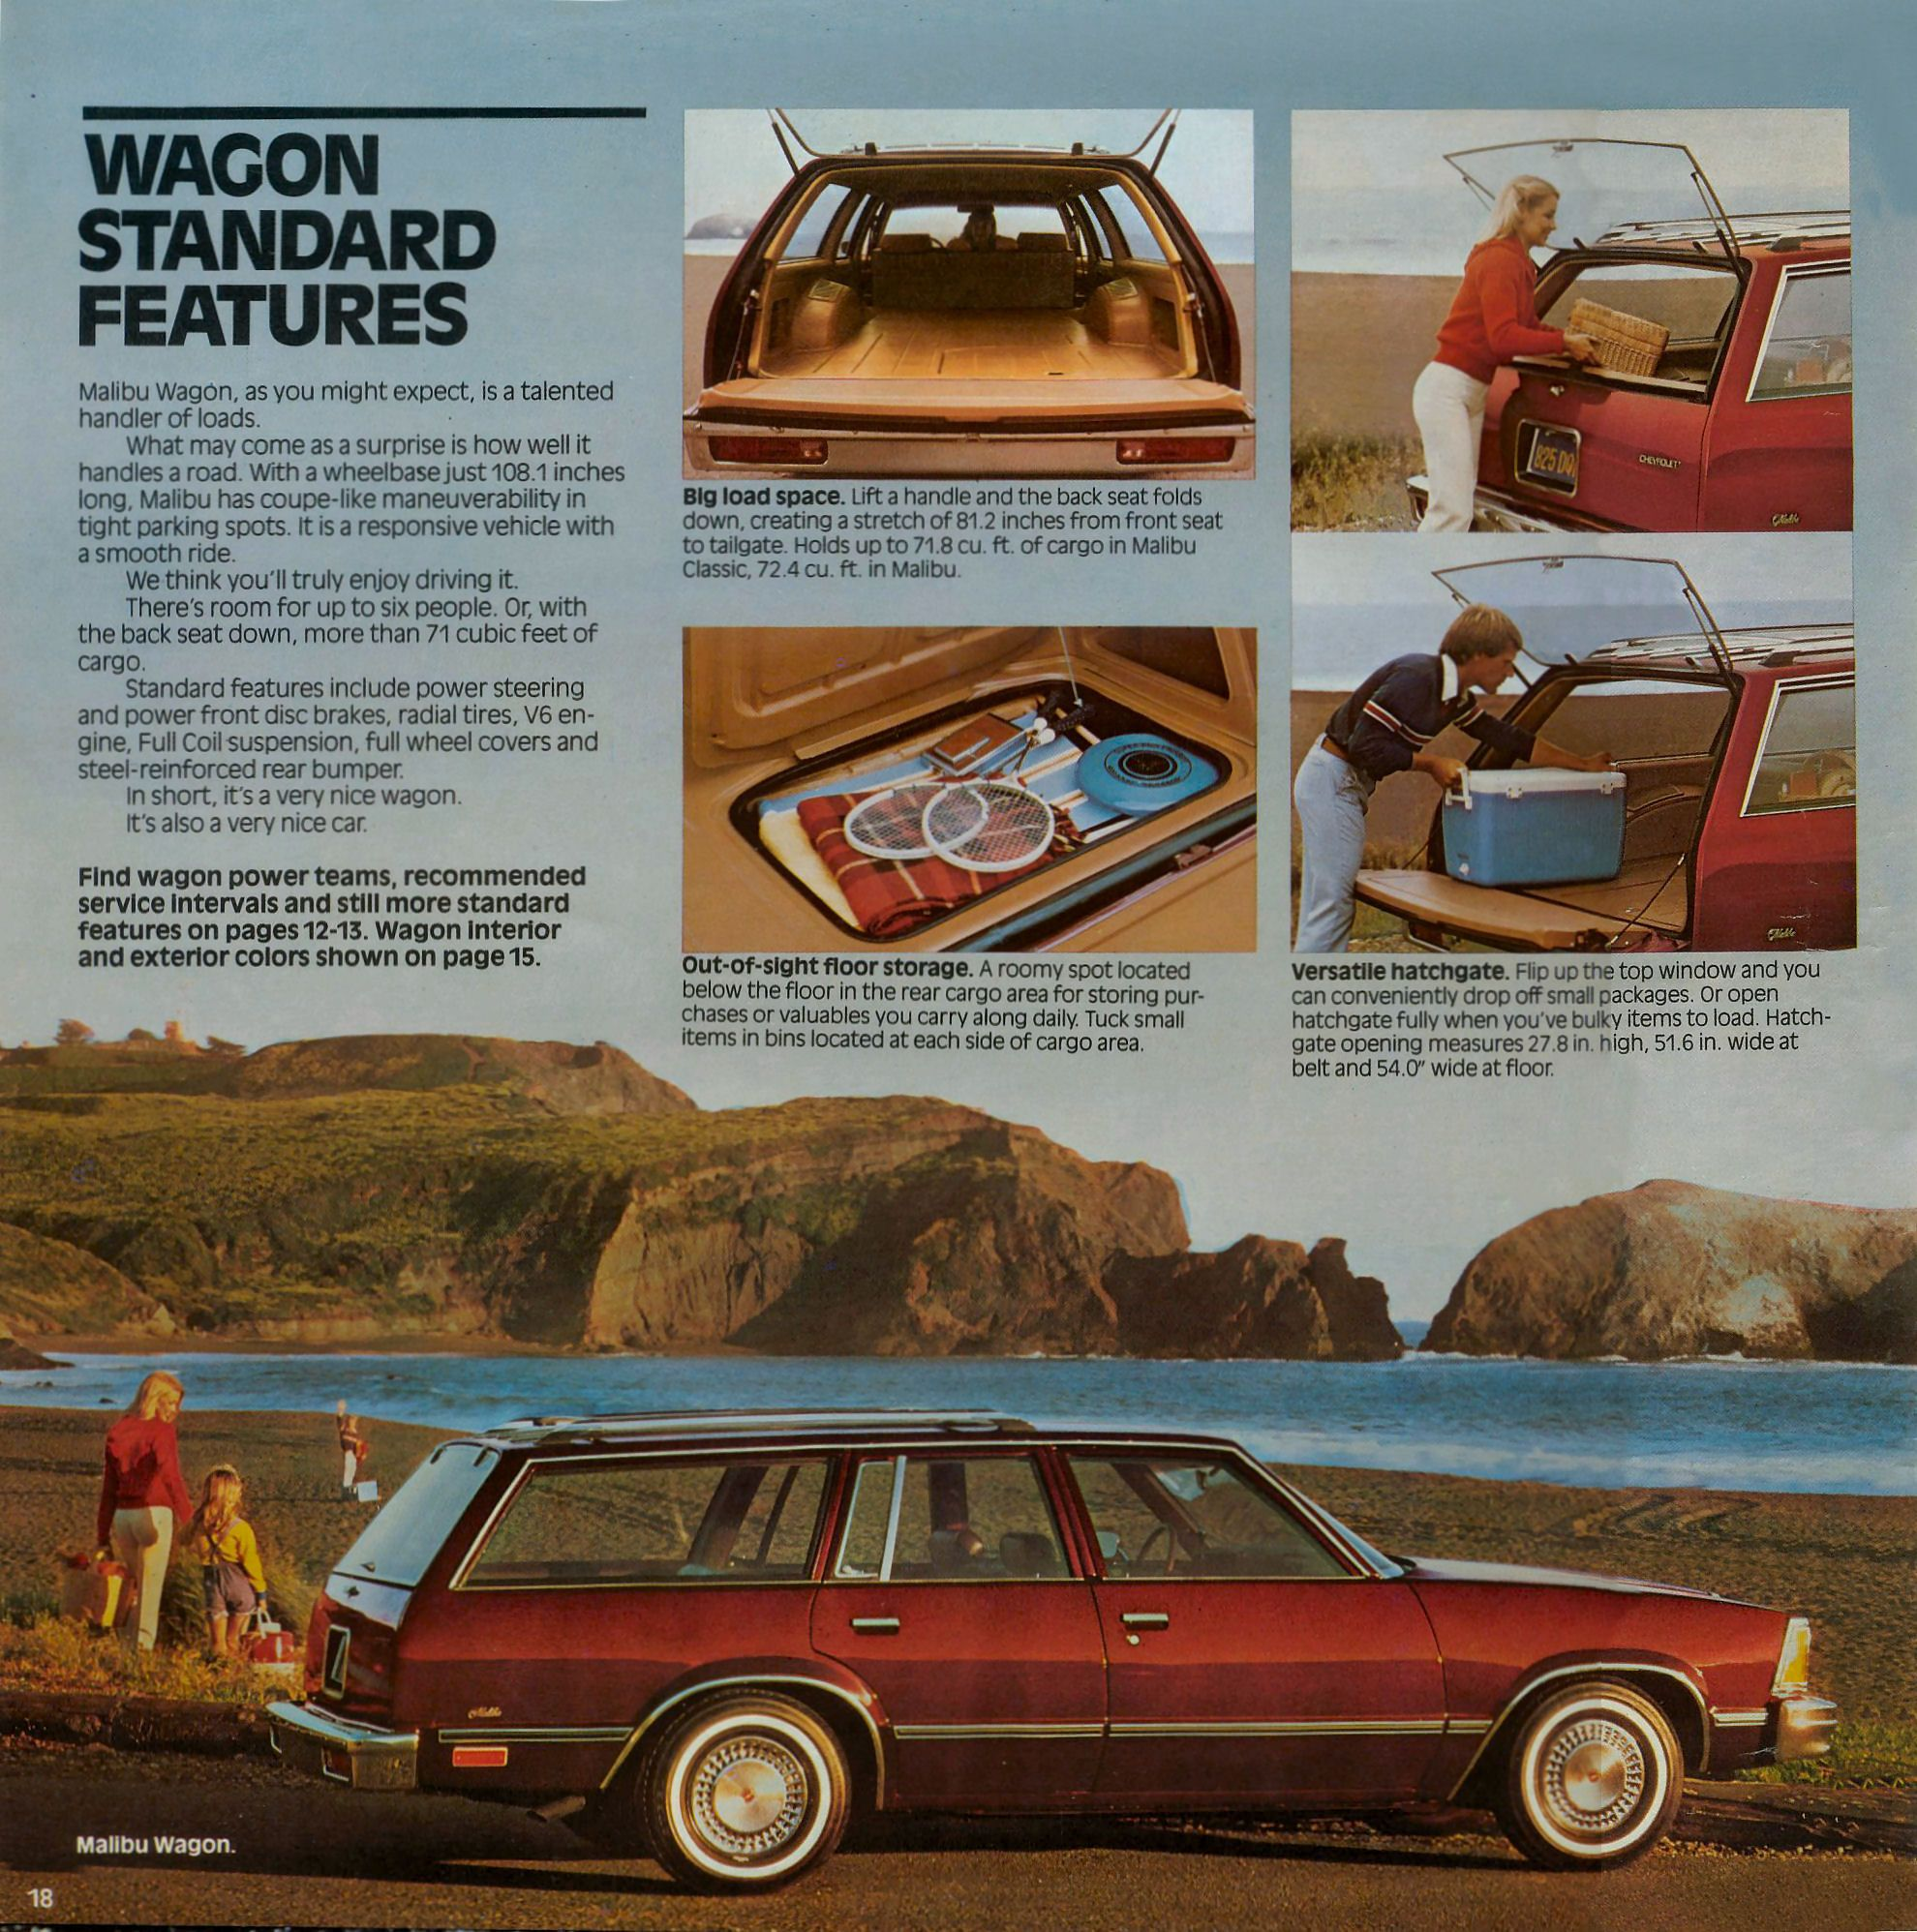 1981 Chevrolet Malibu brochure